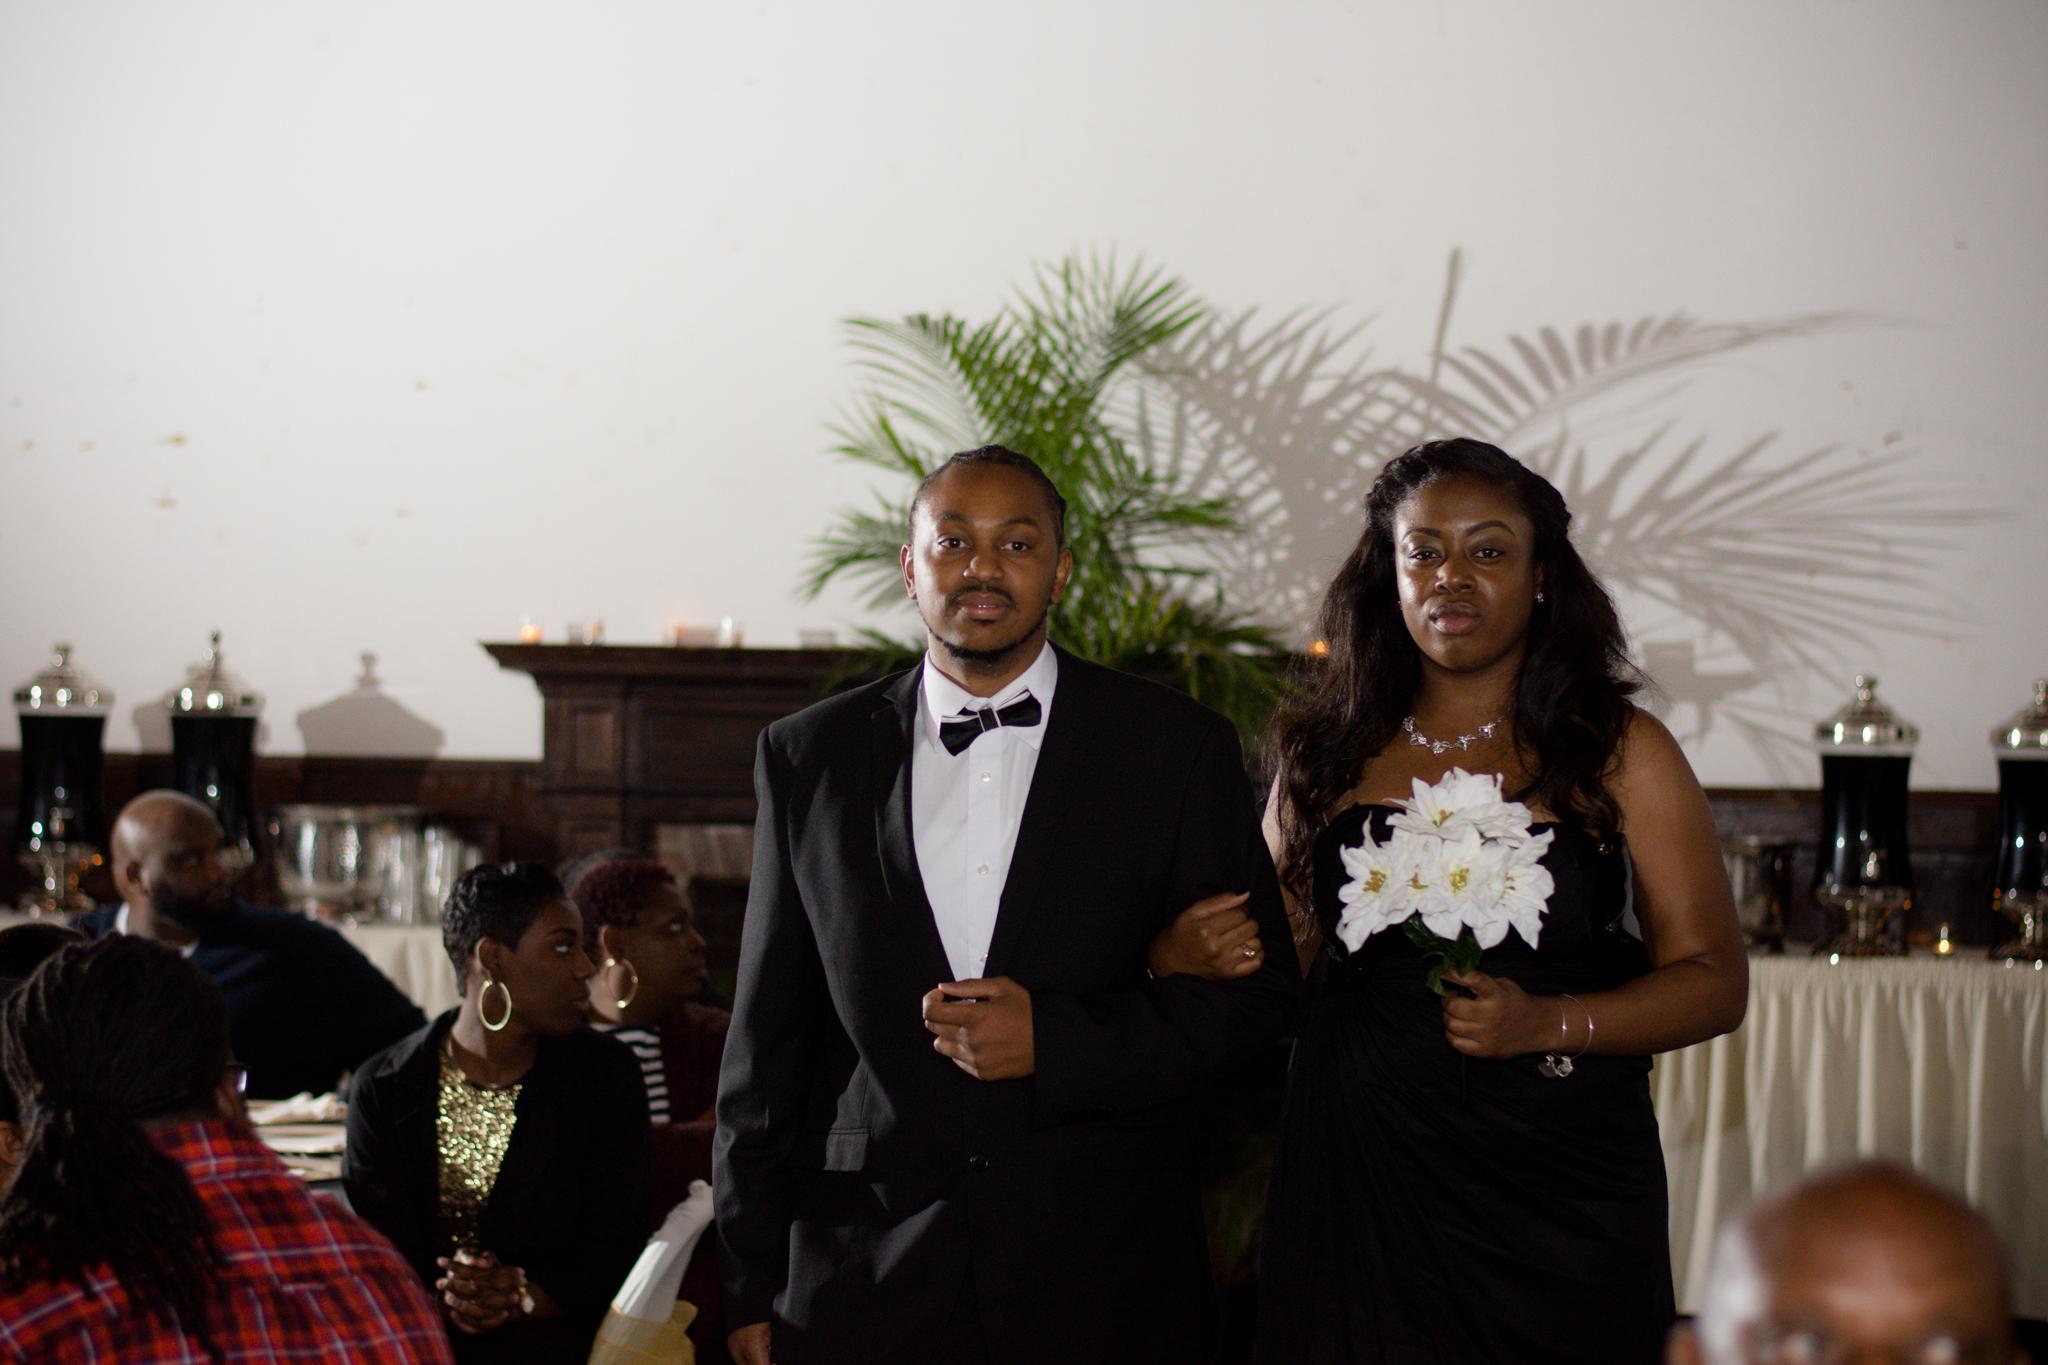 chaplin wedding (126 of 181).JPG